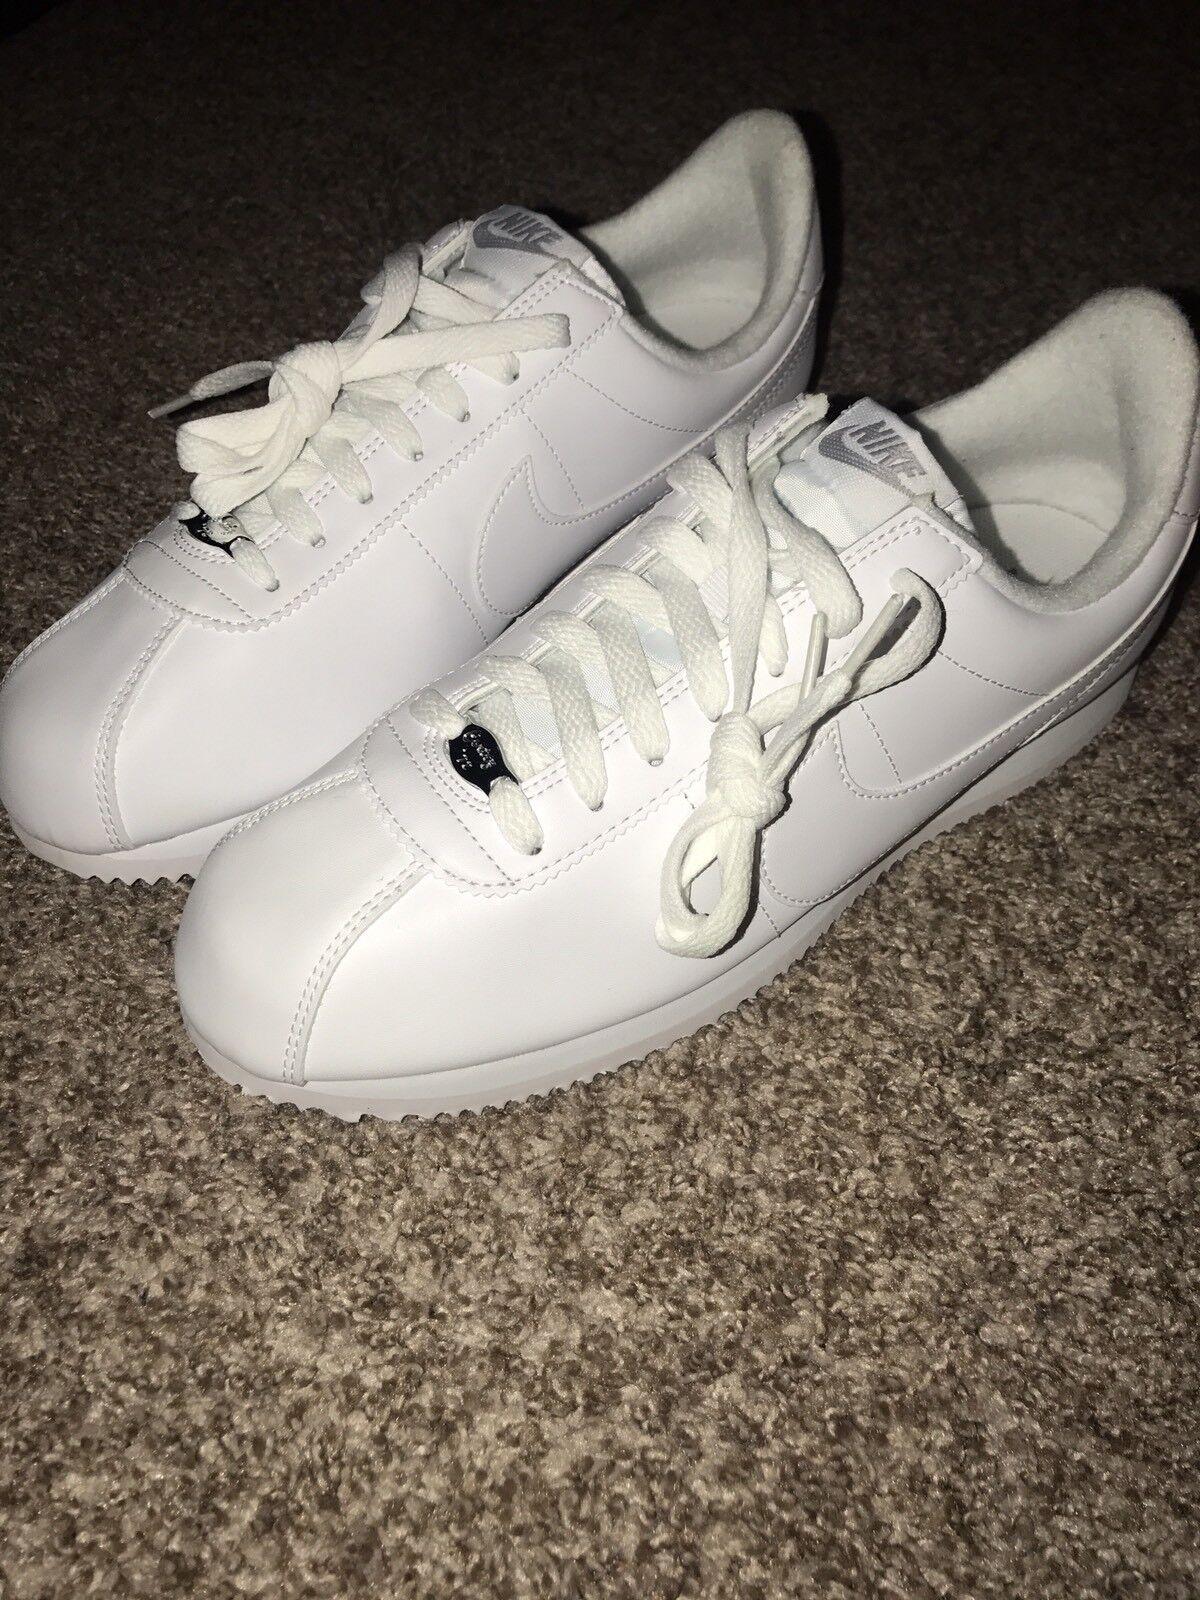 c44d14742 Nike Men s Men s Men s Classic Cortez White Gray Grey Sneaker Shoe US Size  10 819719-110 ef2102